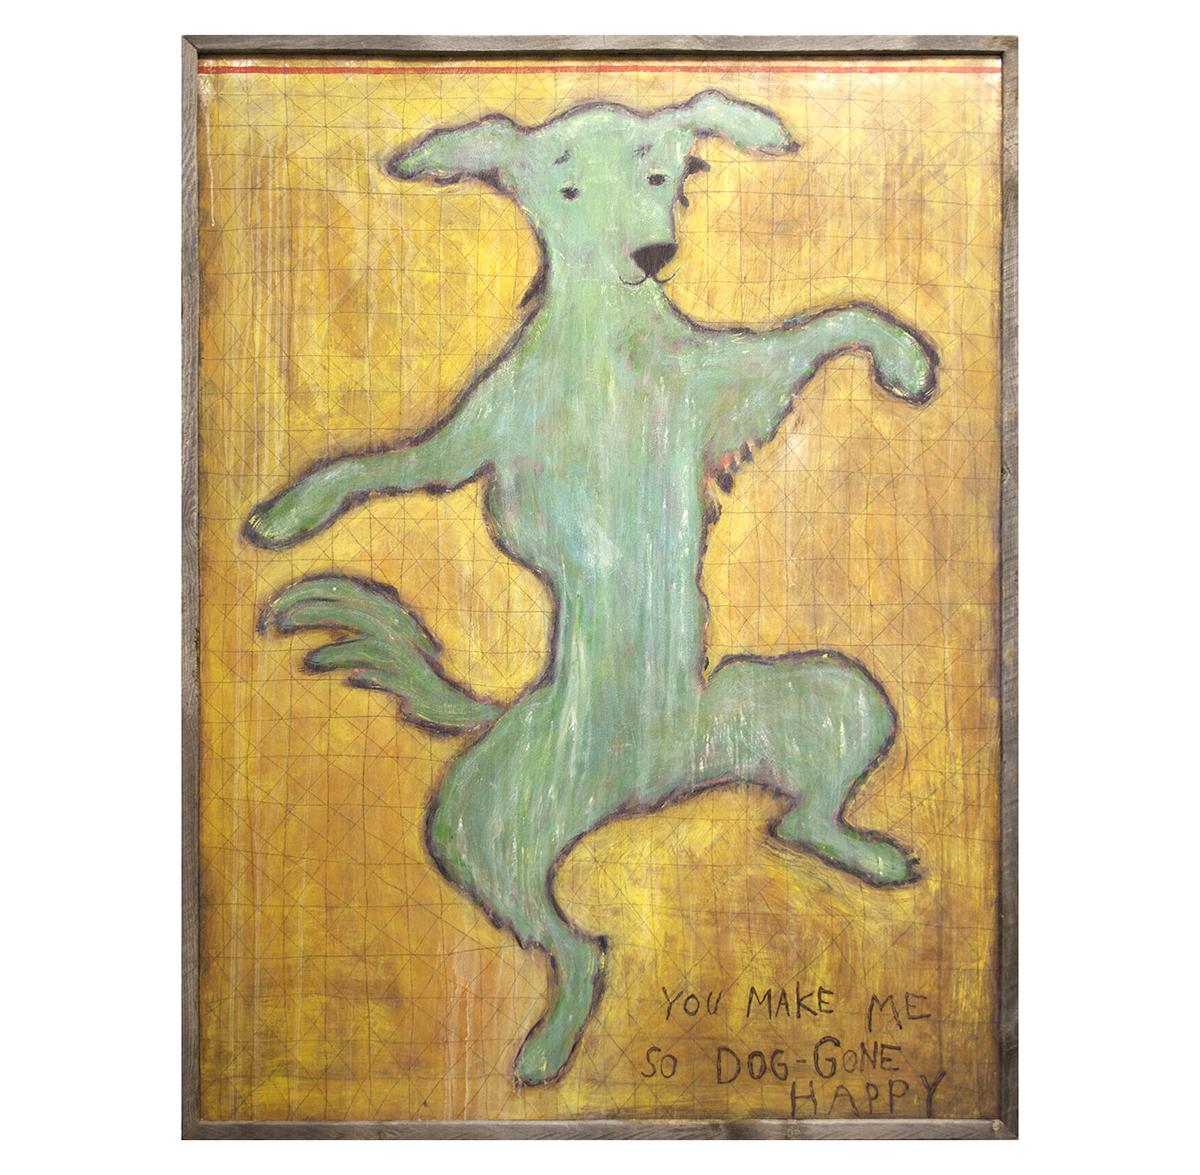 You Make Me So Dog Gone Happy Reclaimed Wood Wall Art - 36 Inch